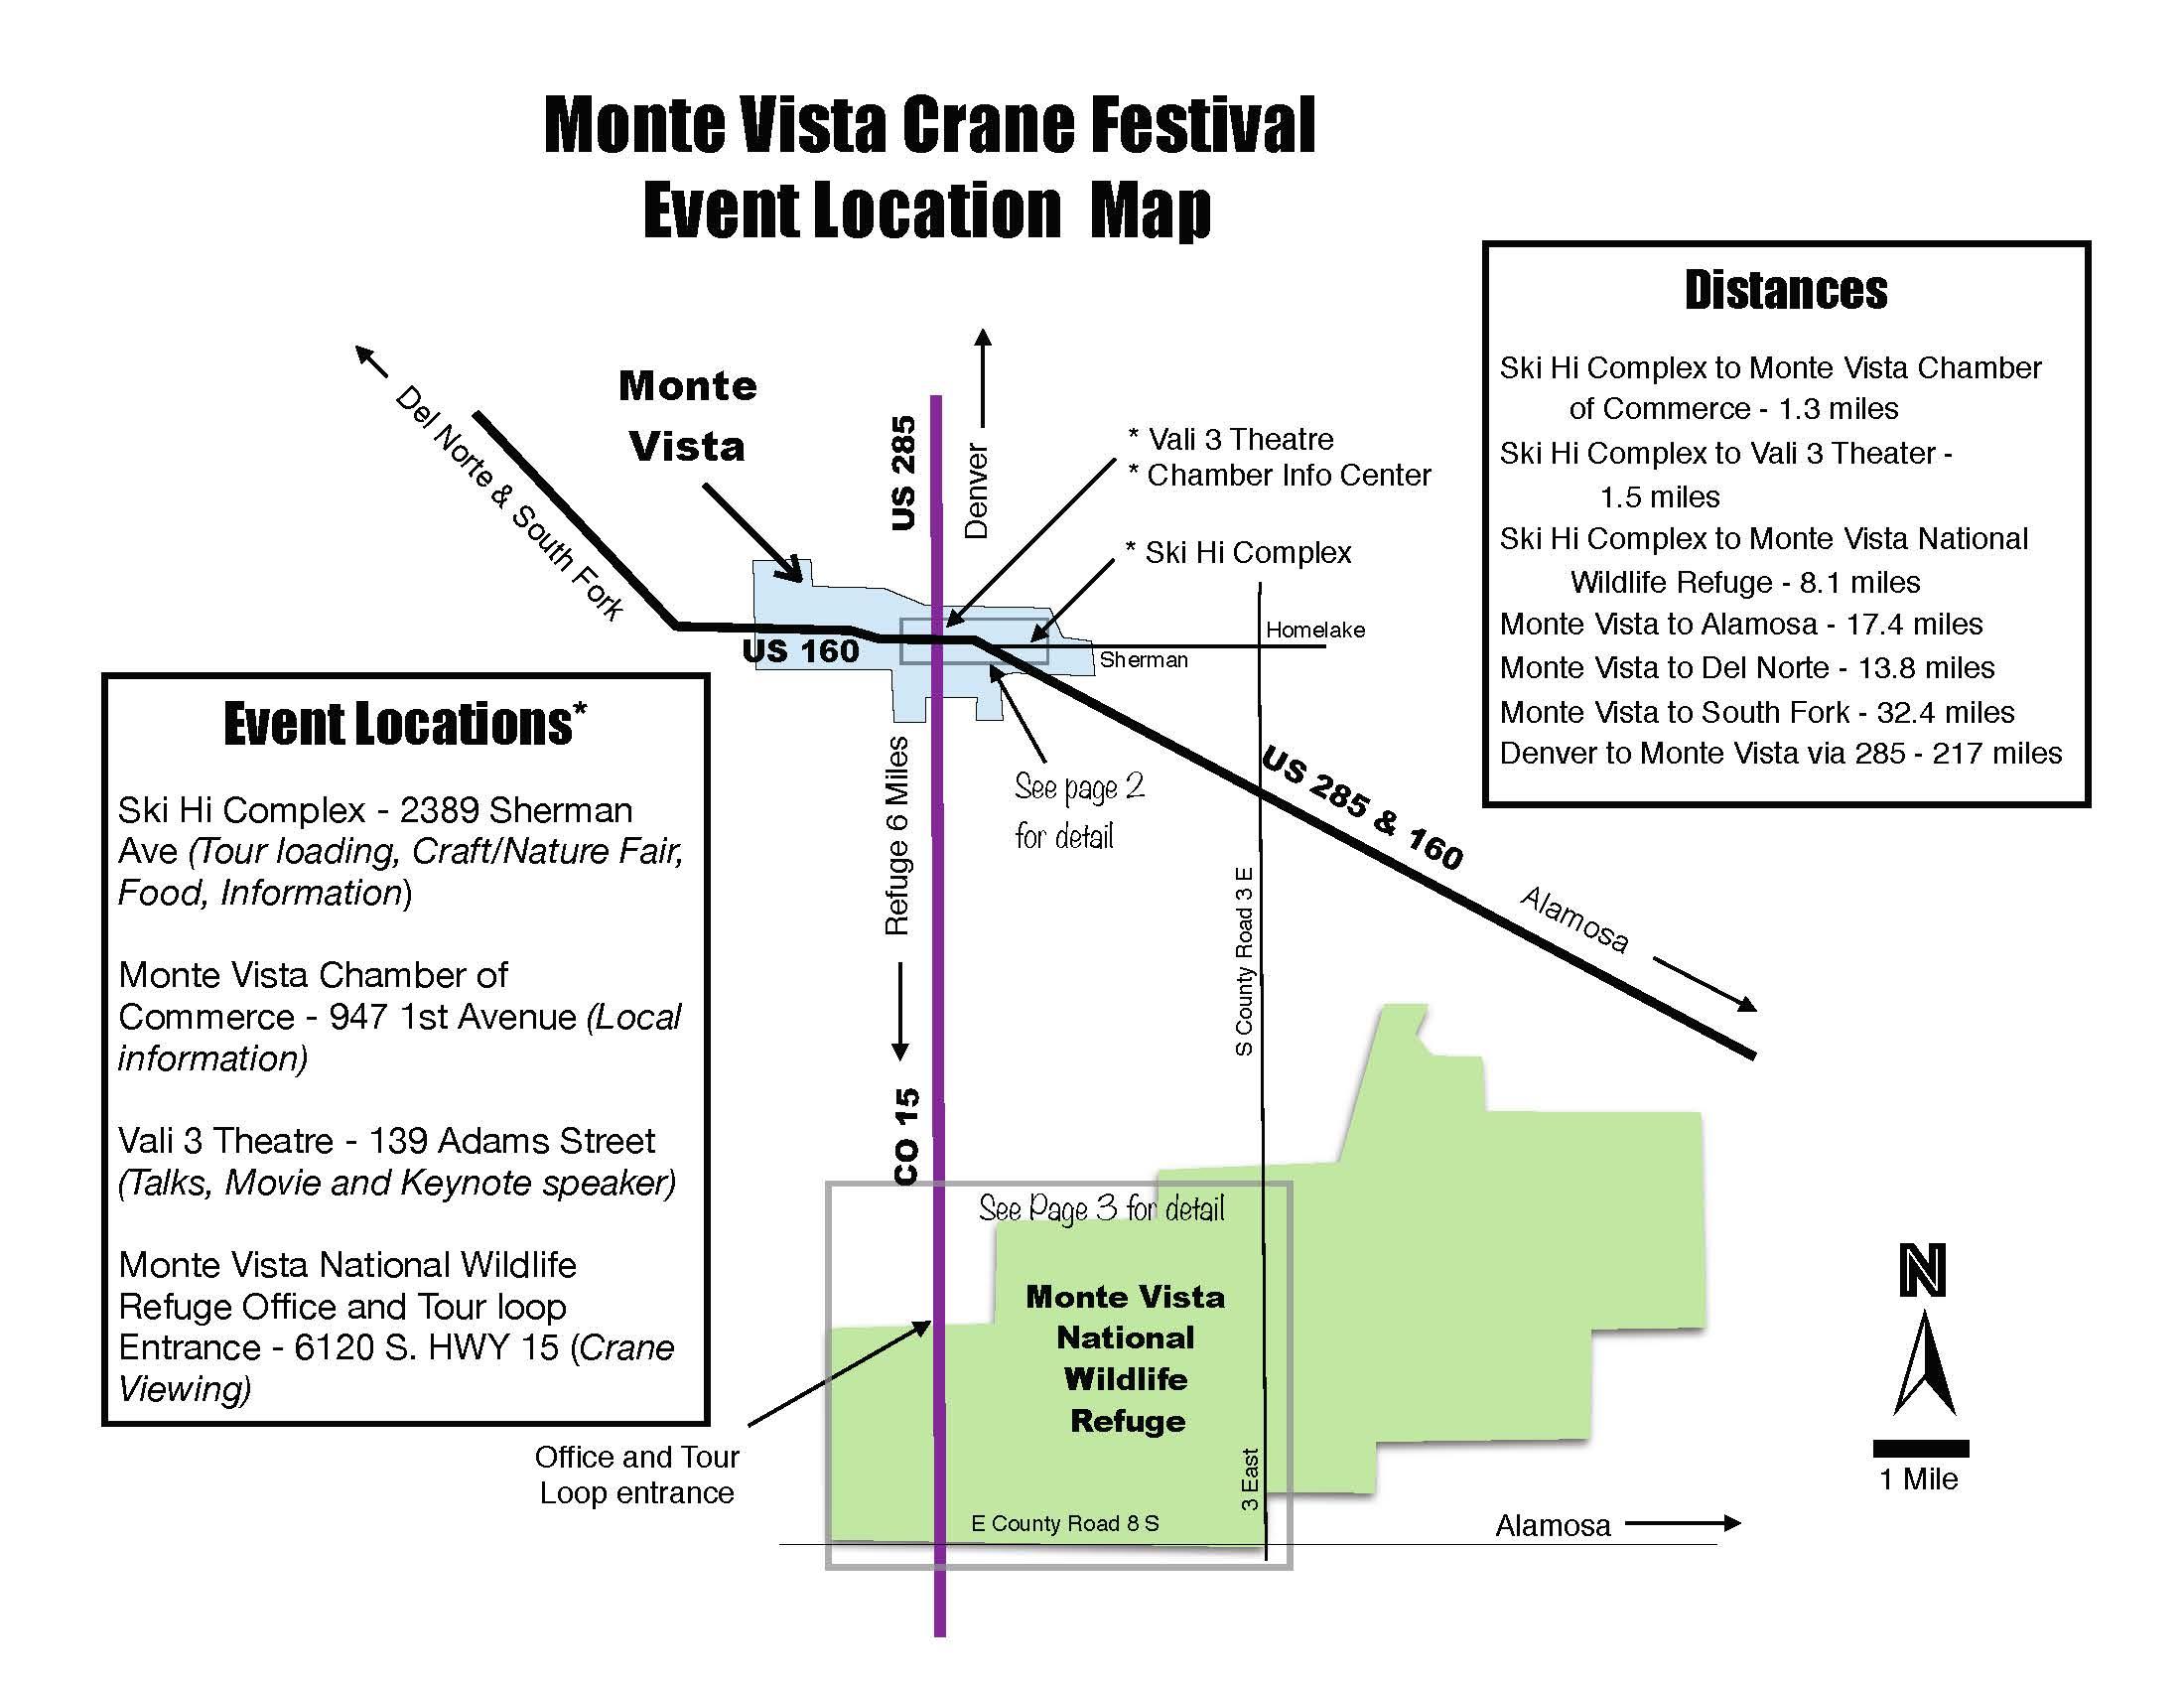 Maps | Monte Vista Crane Fest Del Monte Shopping Center Map on